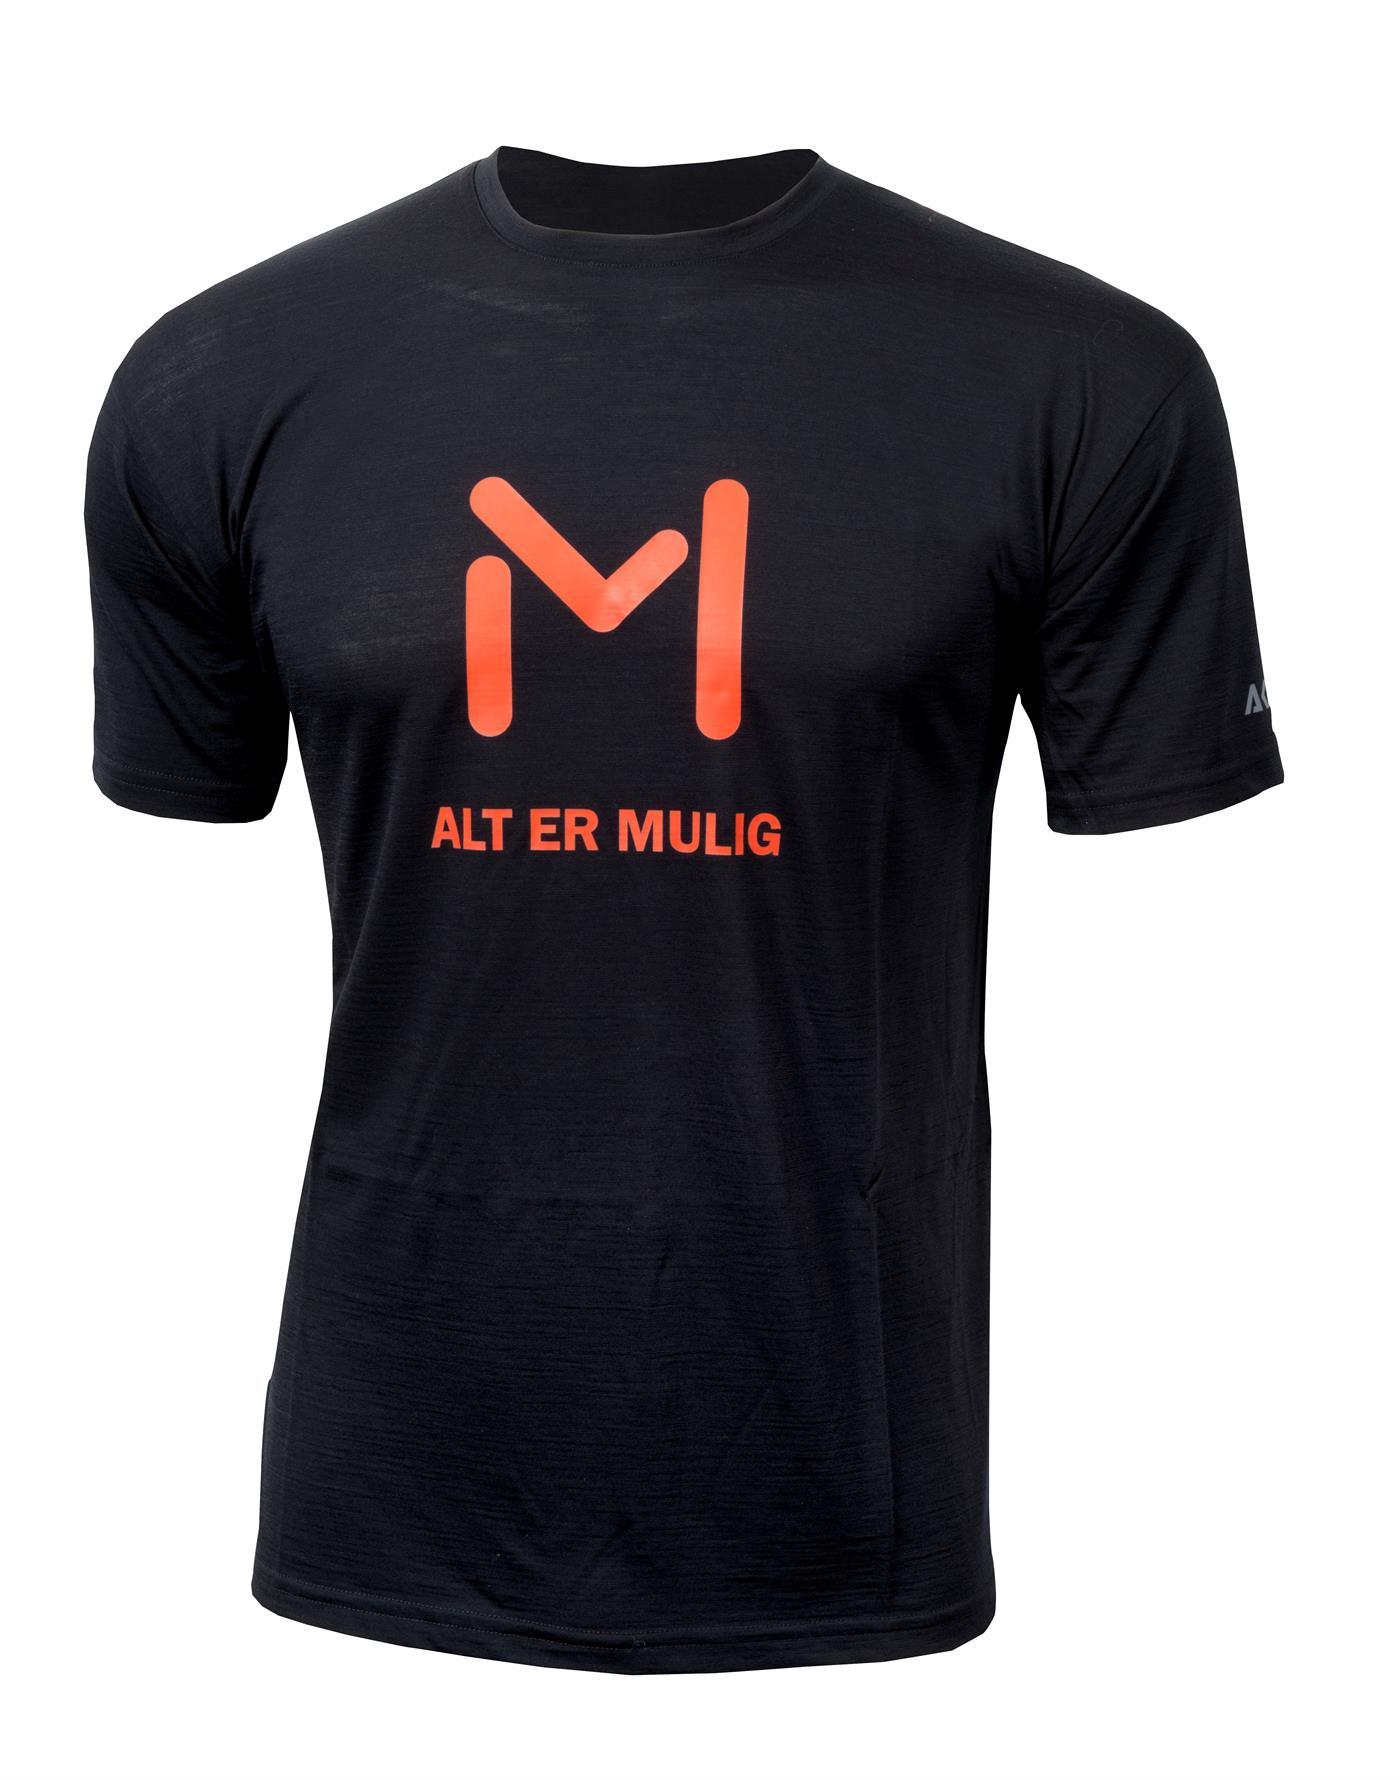 aclima lars monsen anárjohka lightwool t-shirt unisex - jet black